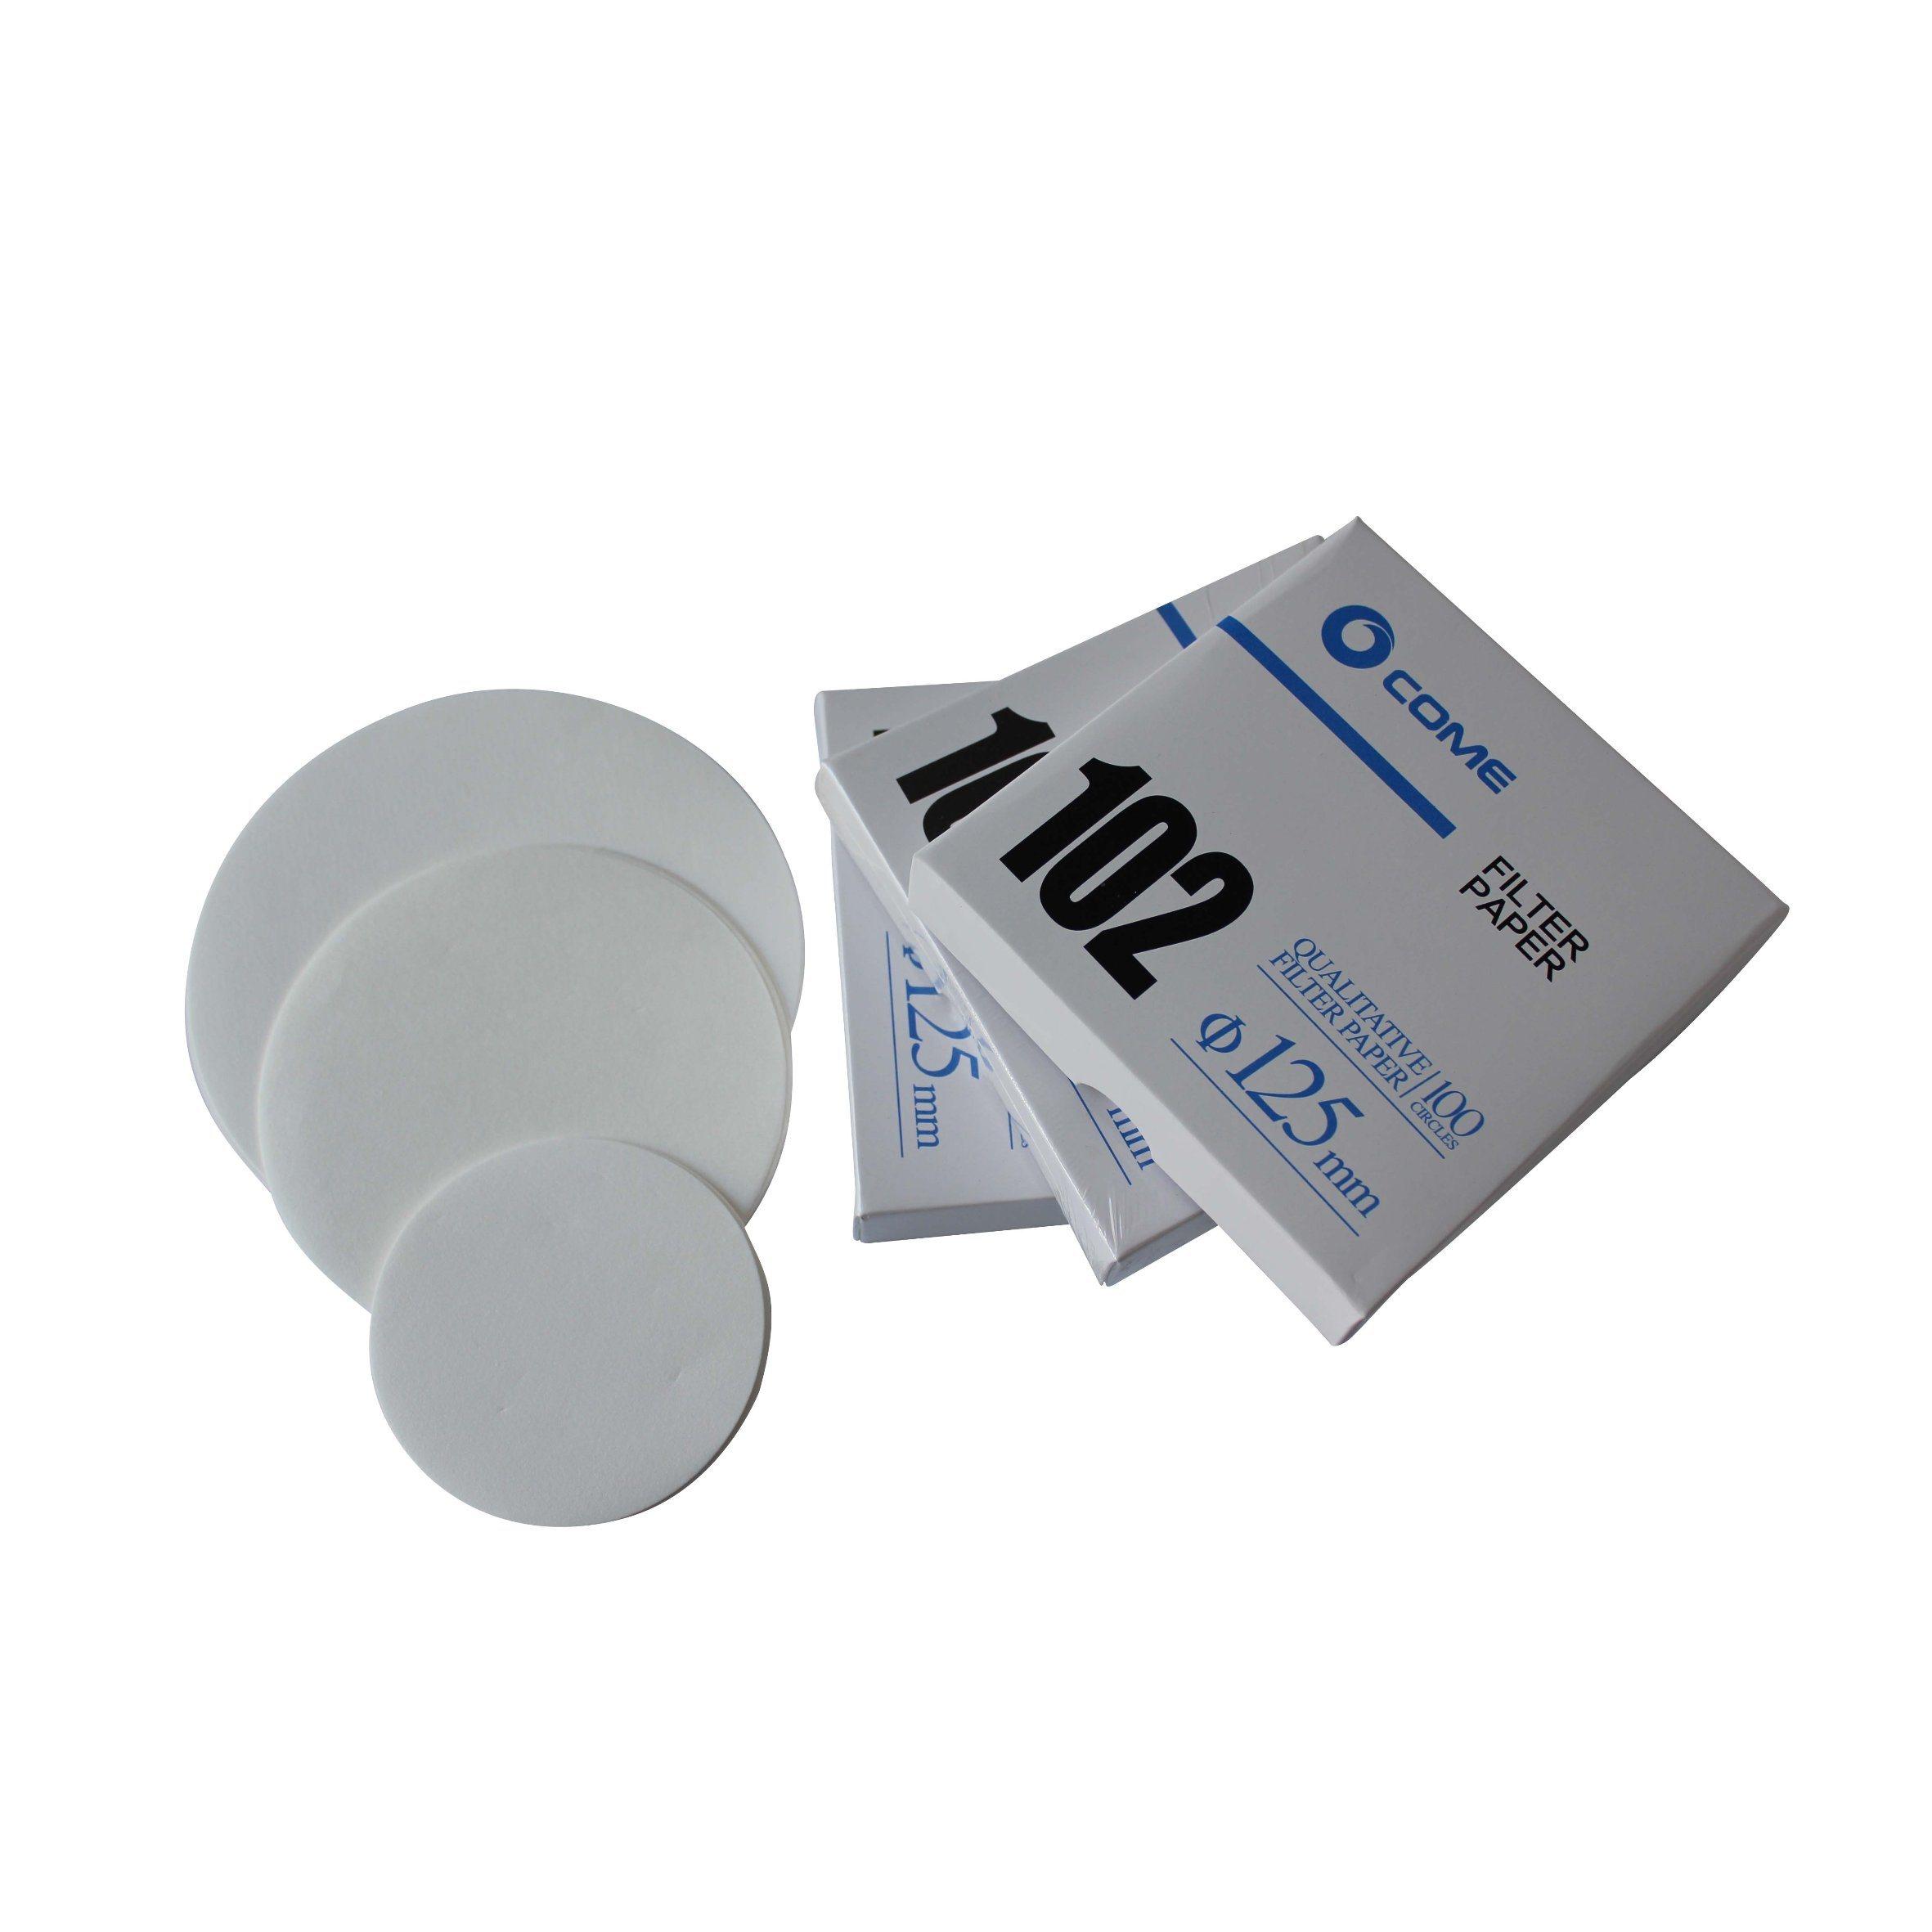 New Premium 100% Cellulose Qualitative Filter Paper for Paper Filtro